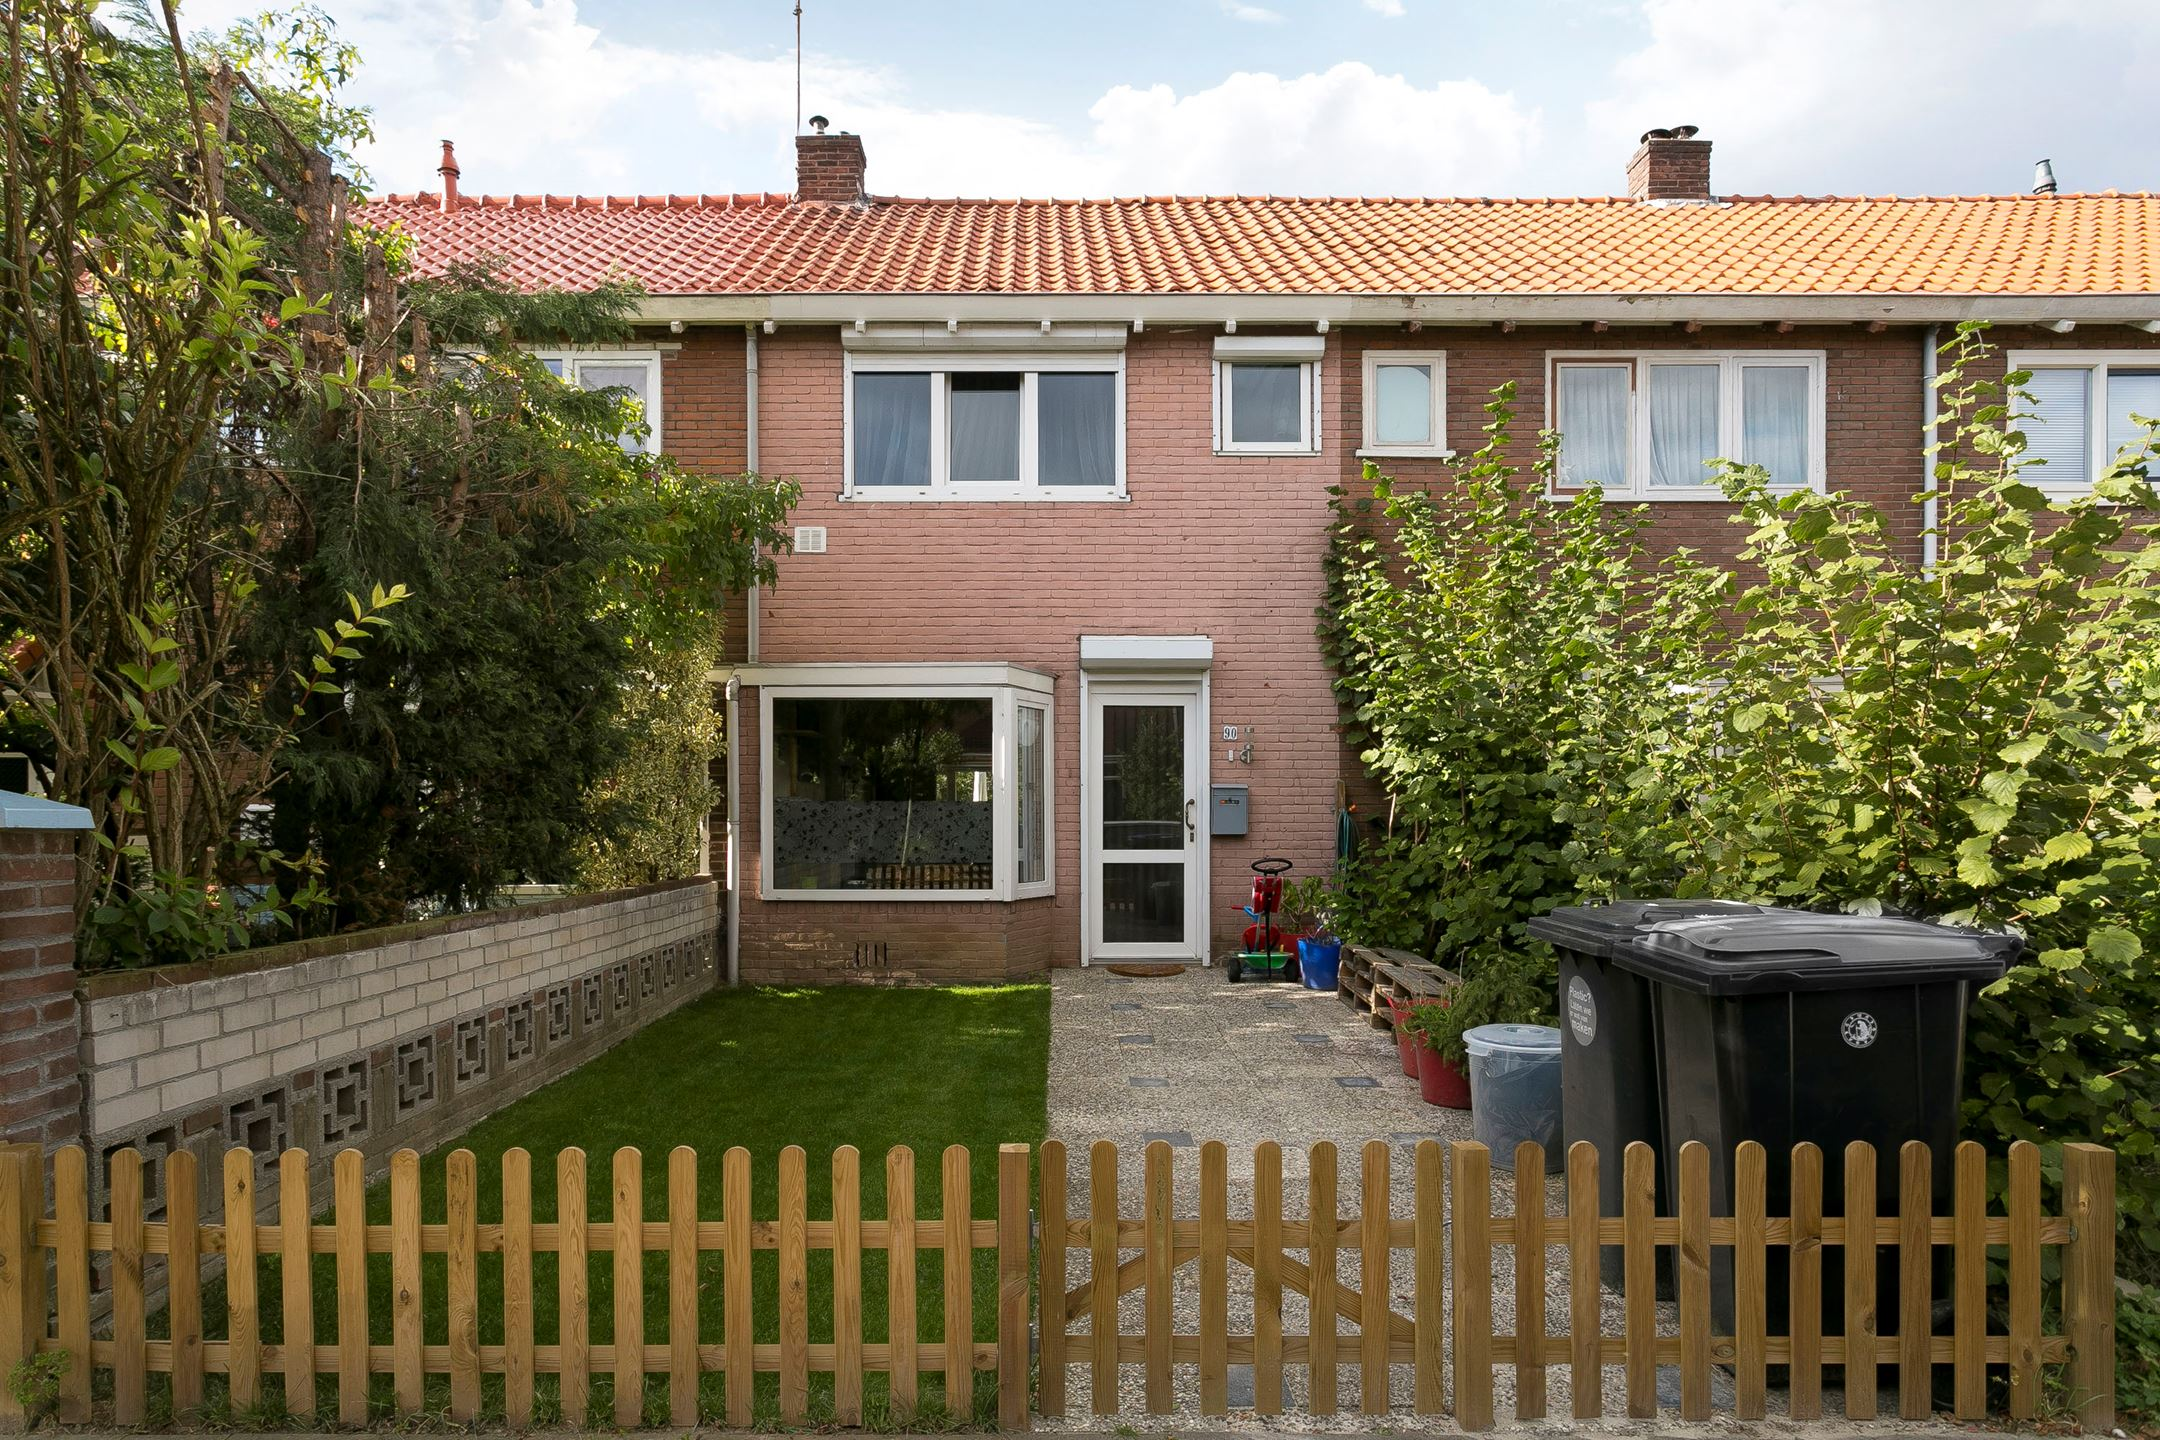 Huis te koop: Forelstraat 90 6833 BM Arnhem [funda]